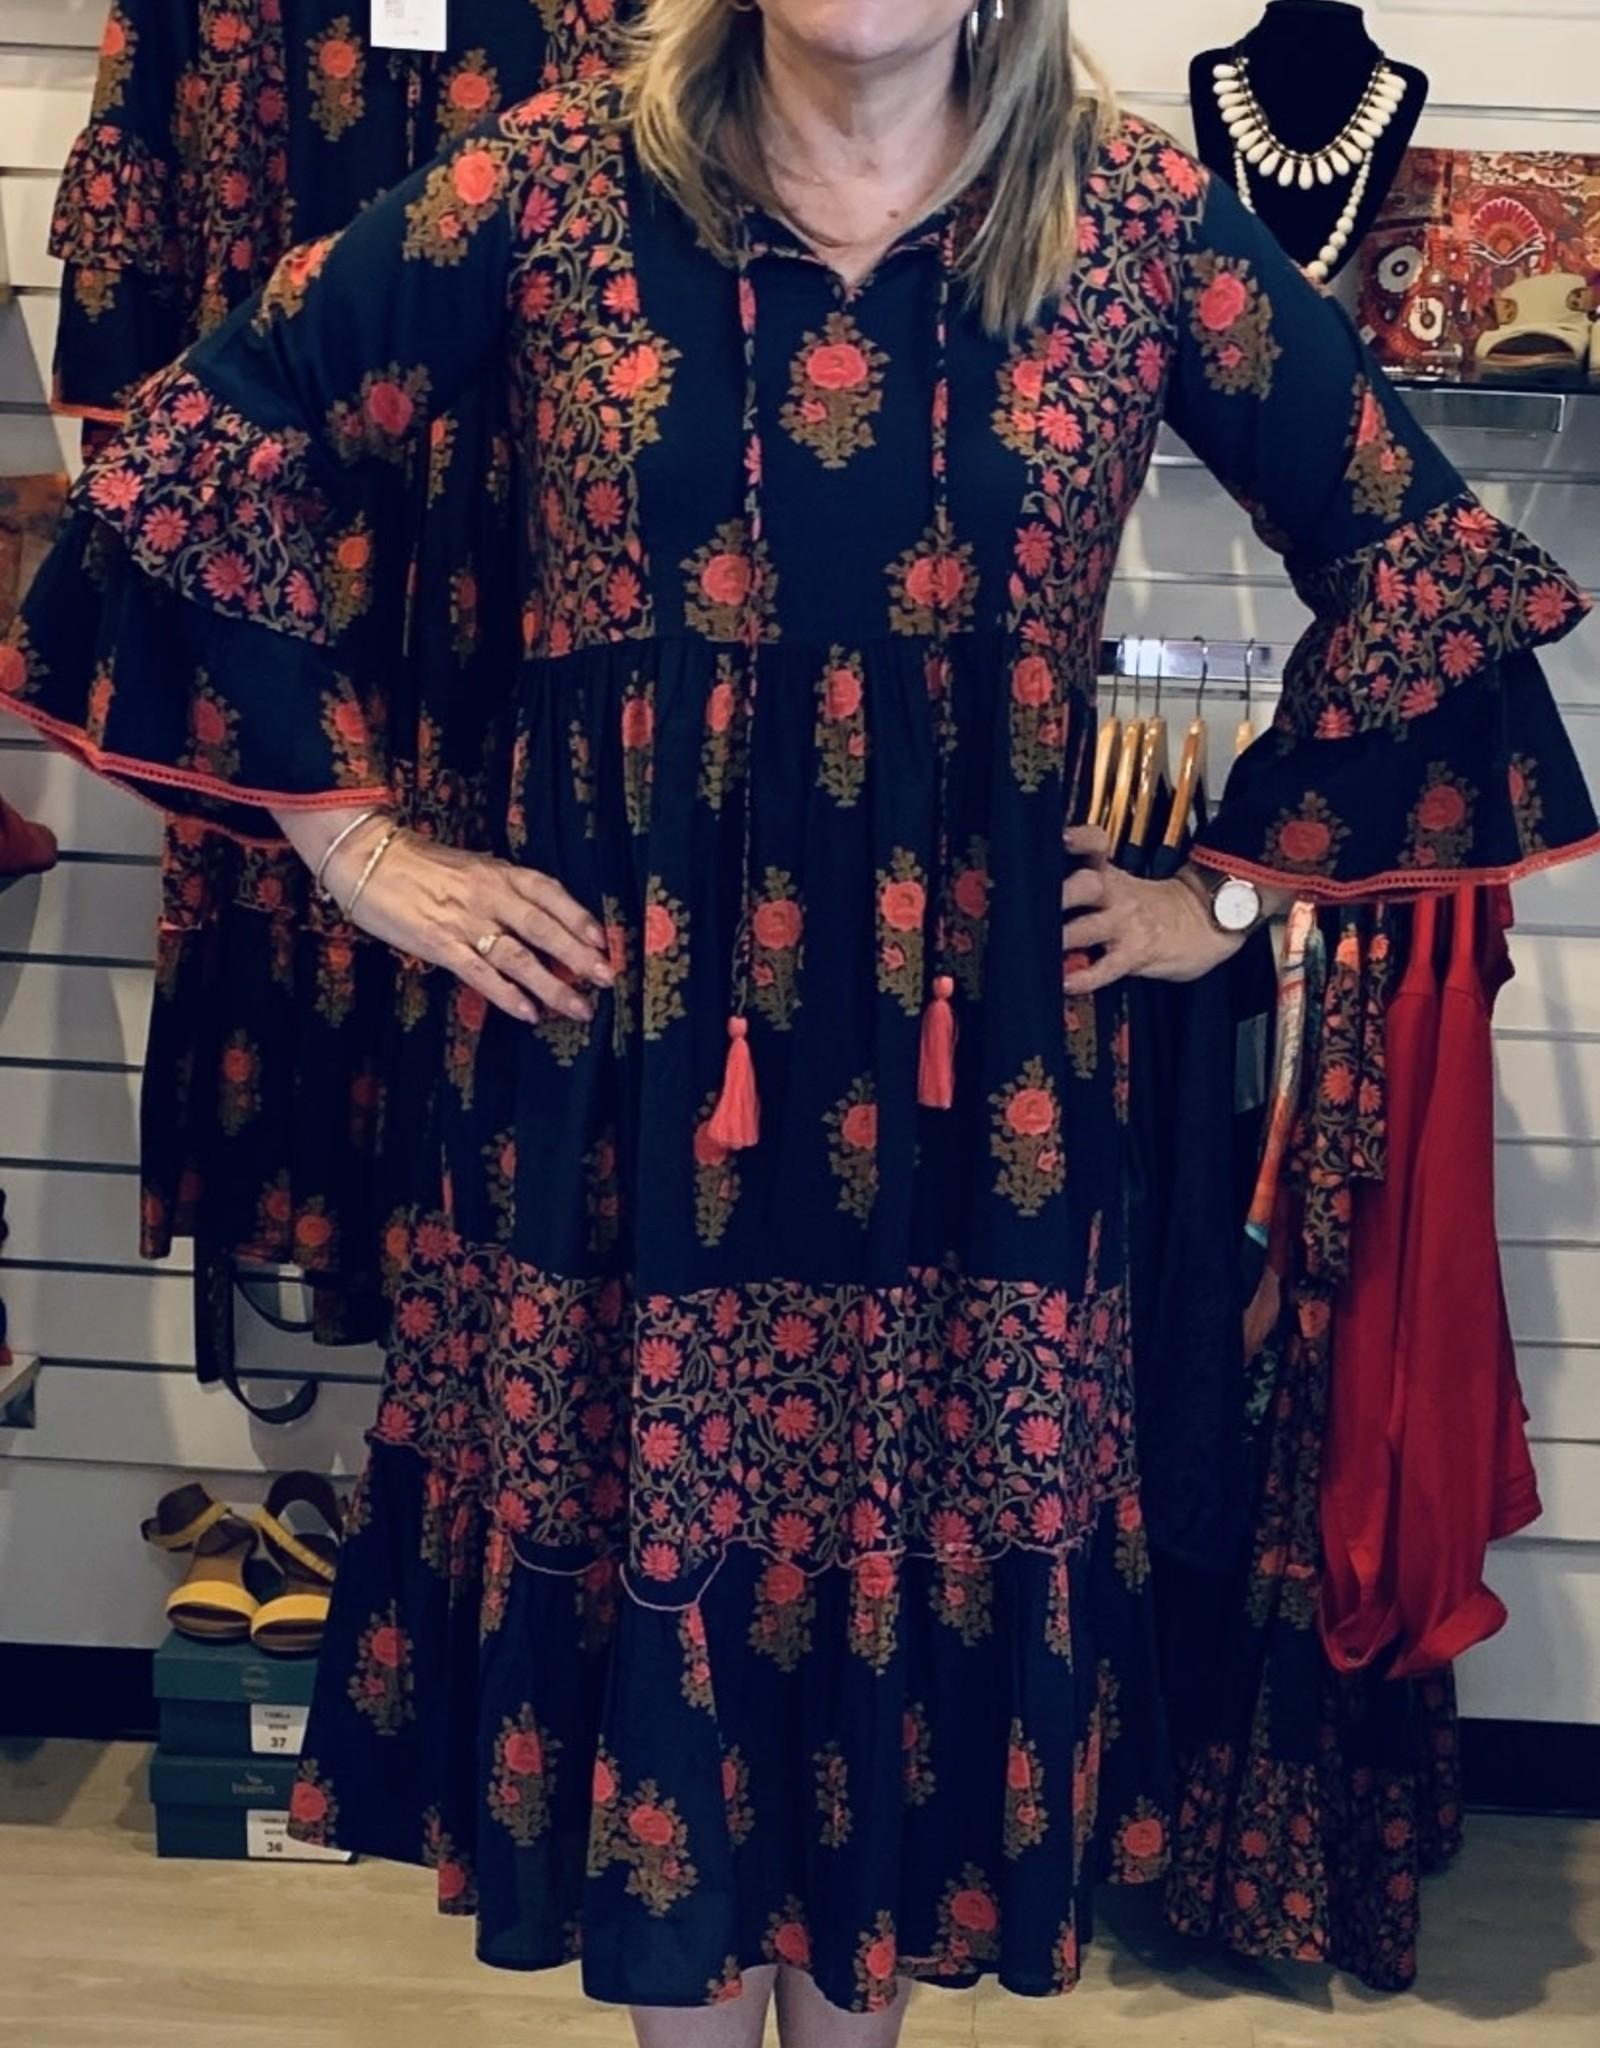 Naudic Primrose Ketchup Dress